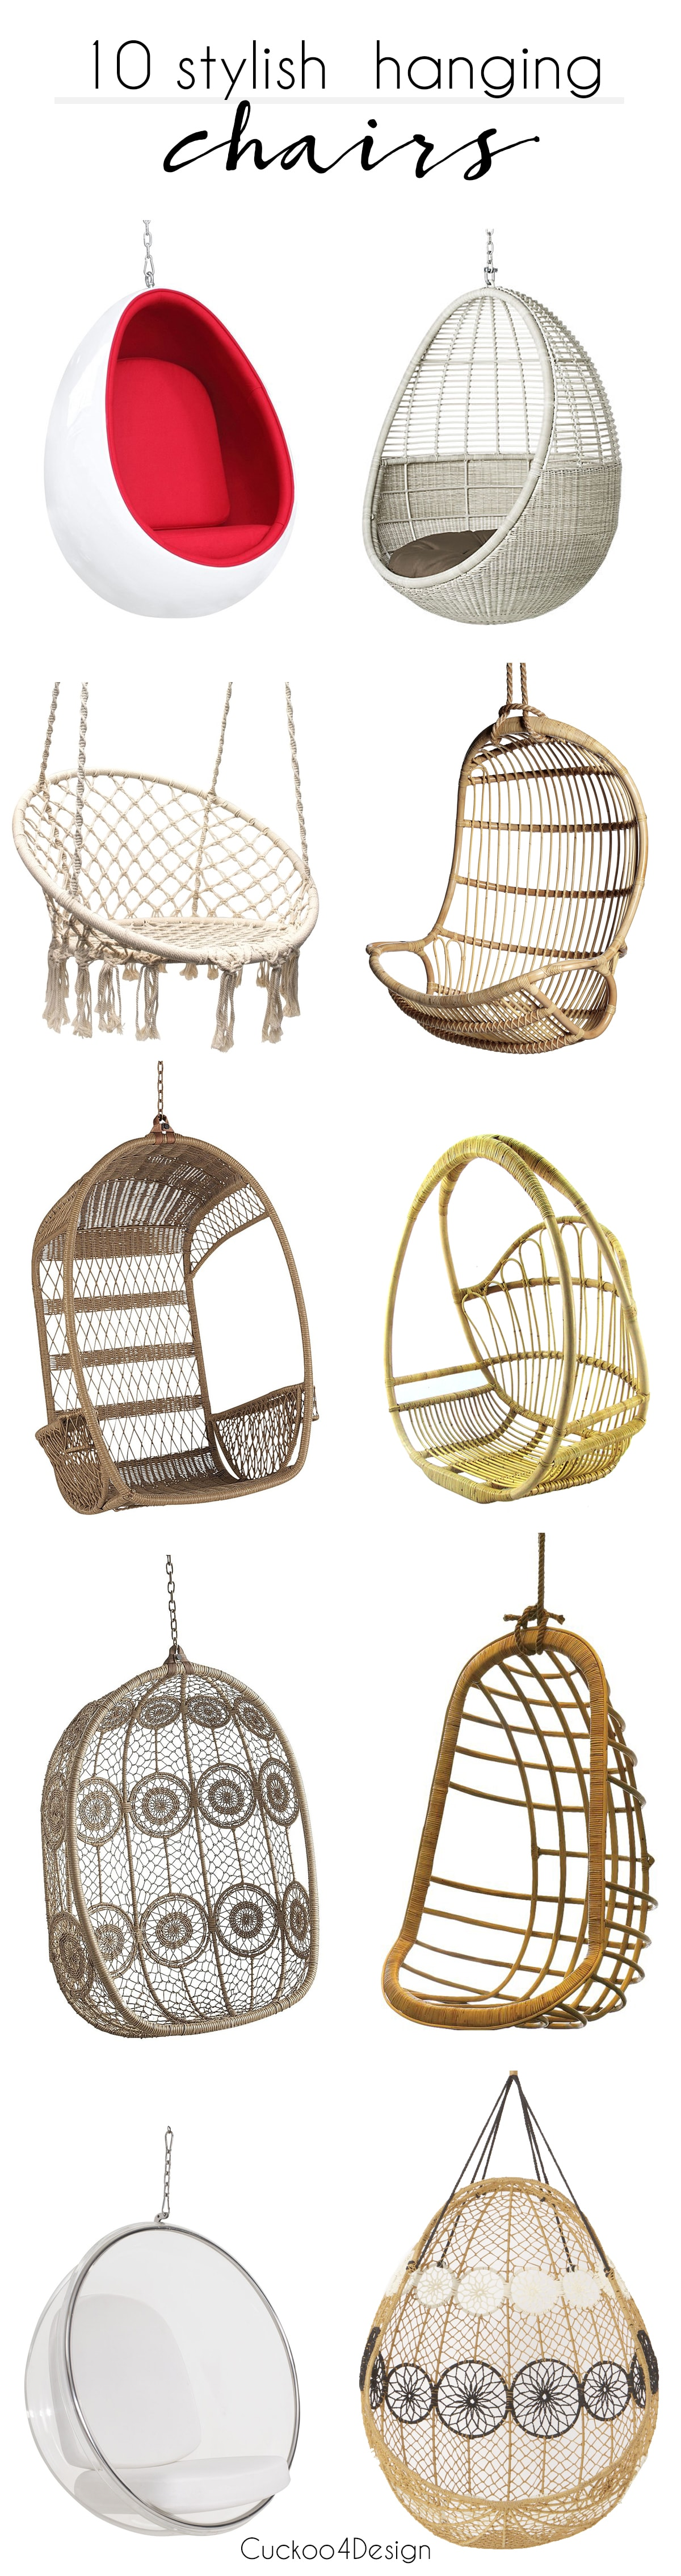 Friday Favorites: 10 Stylish Hanging Chairs